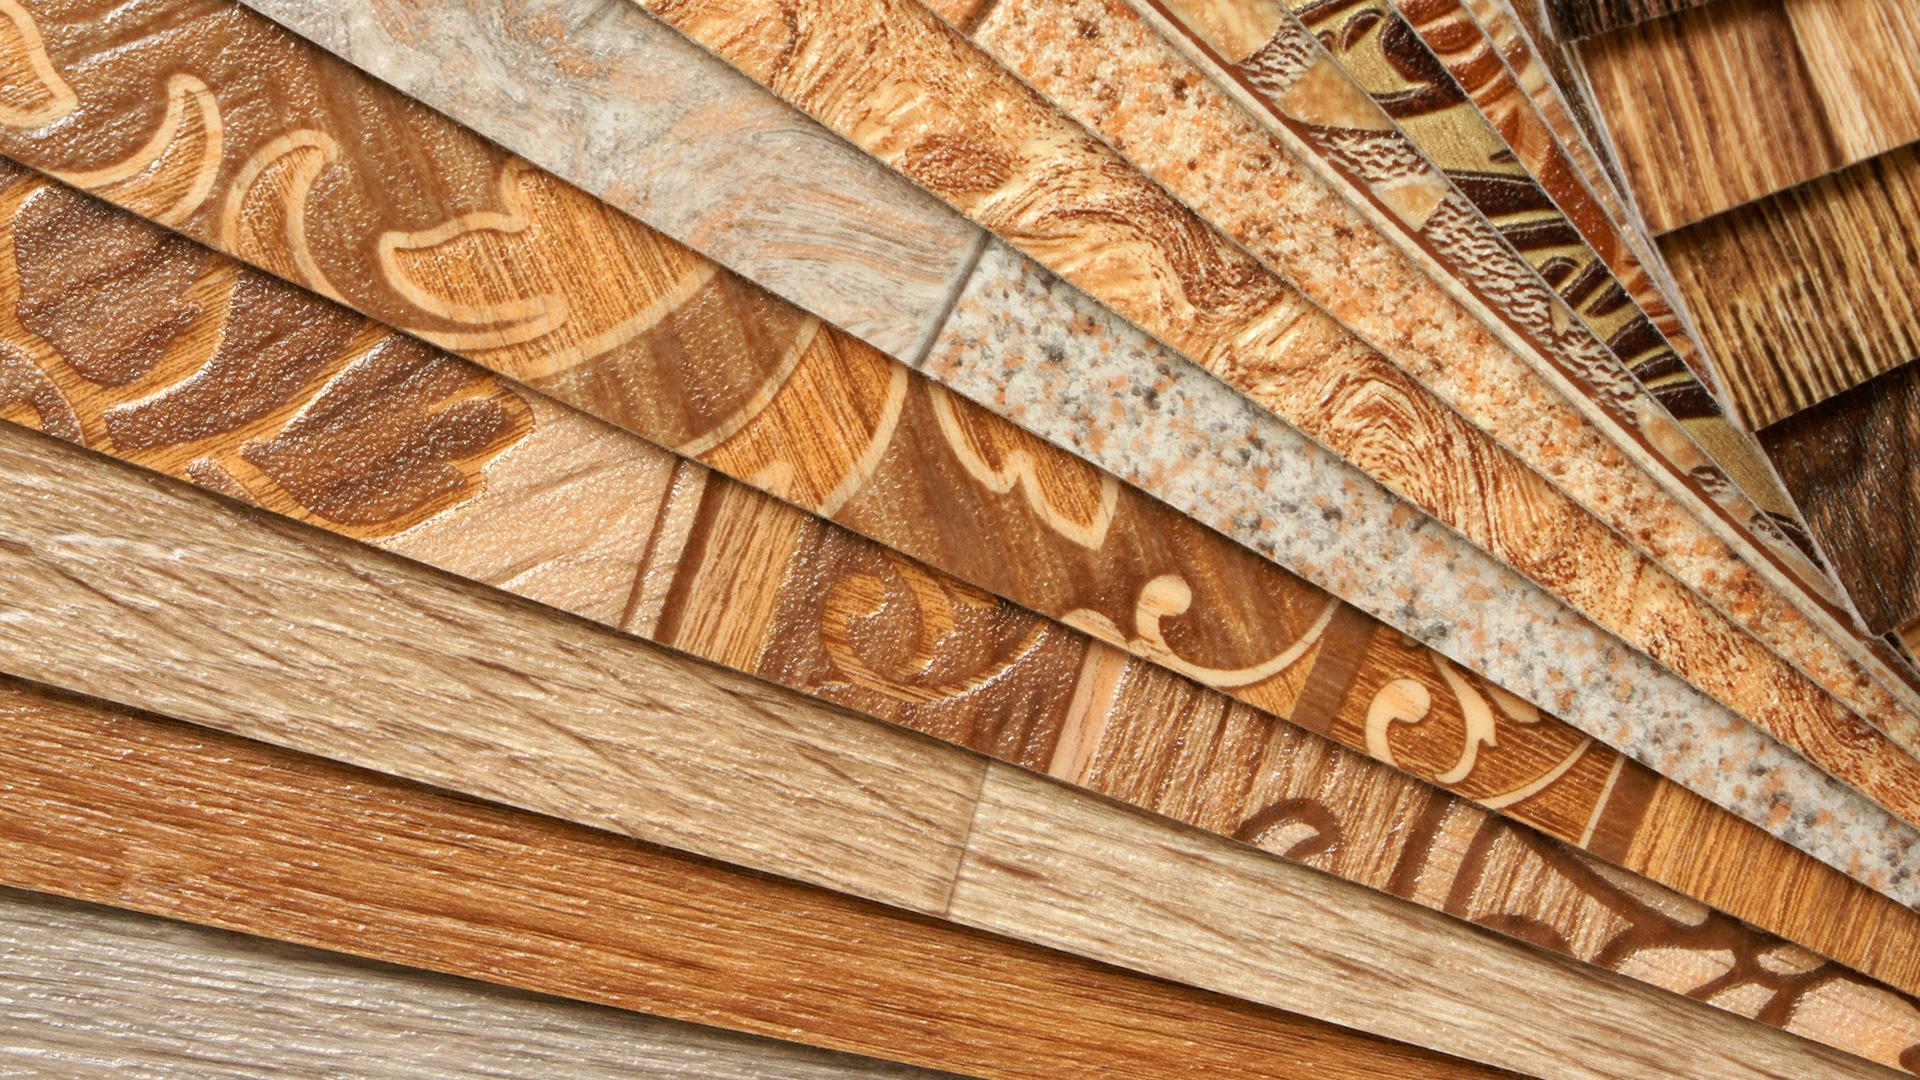 vinyl flooring pittsburgh hardwood flooring laminate flooring and hardwood refinishing. Black Bedroom Furniture Sets. Home Design Ideas